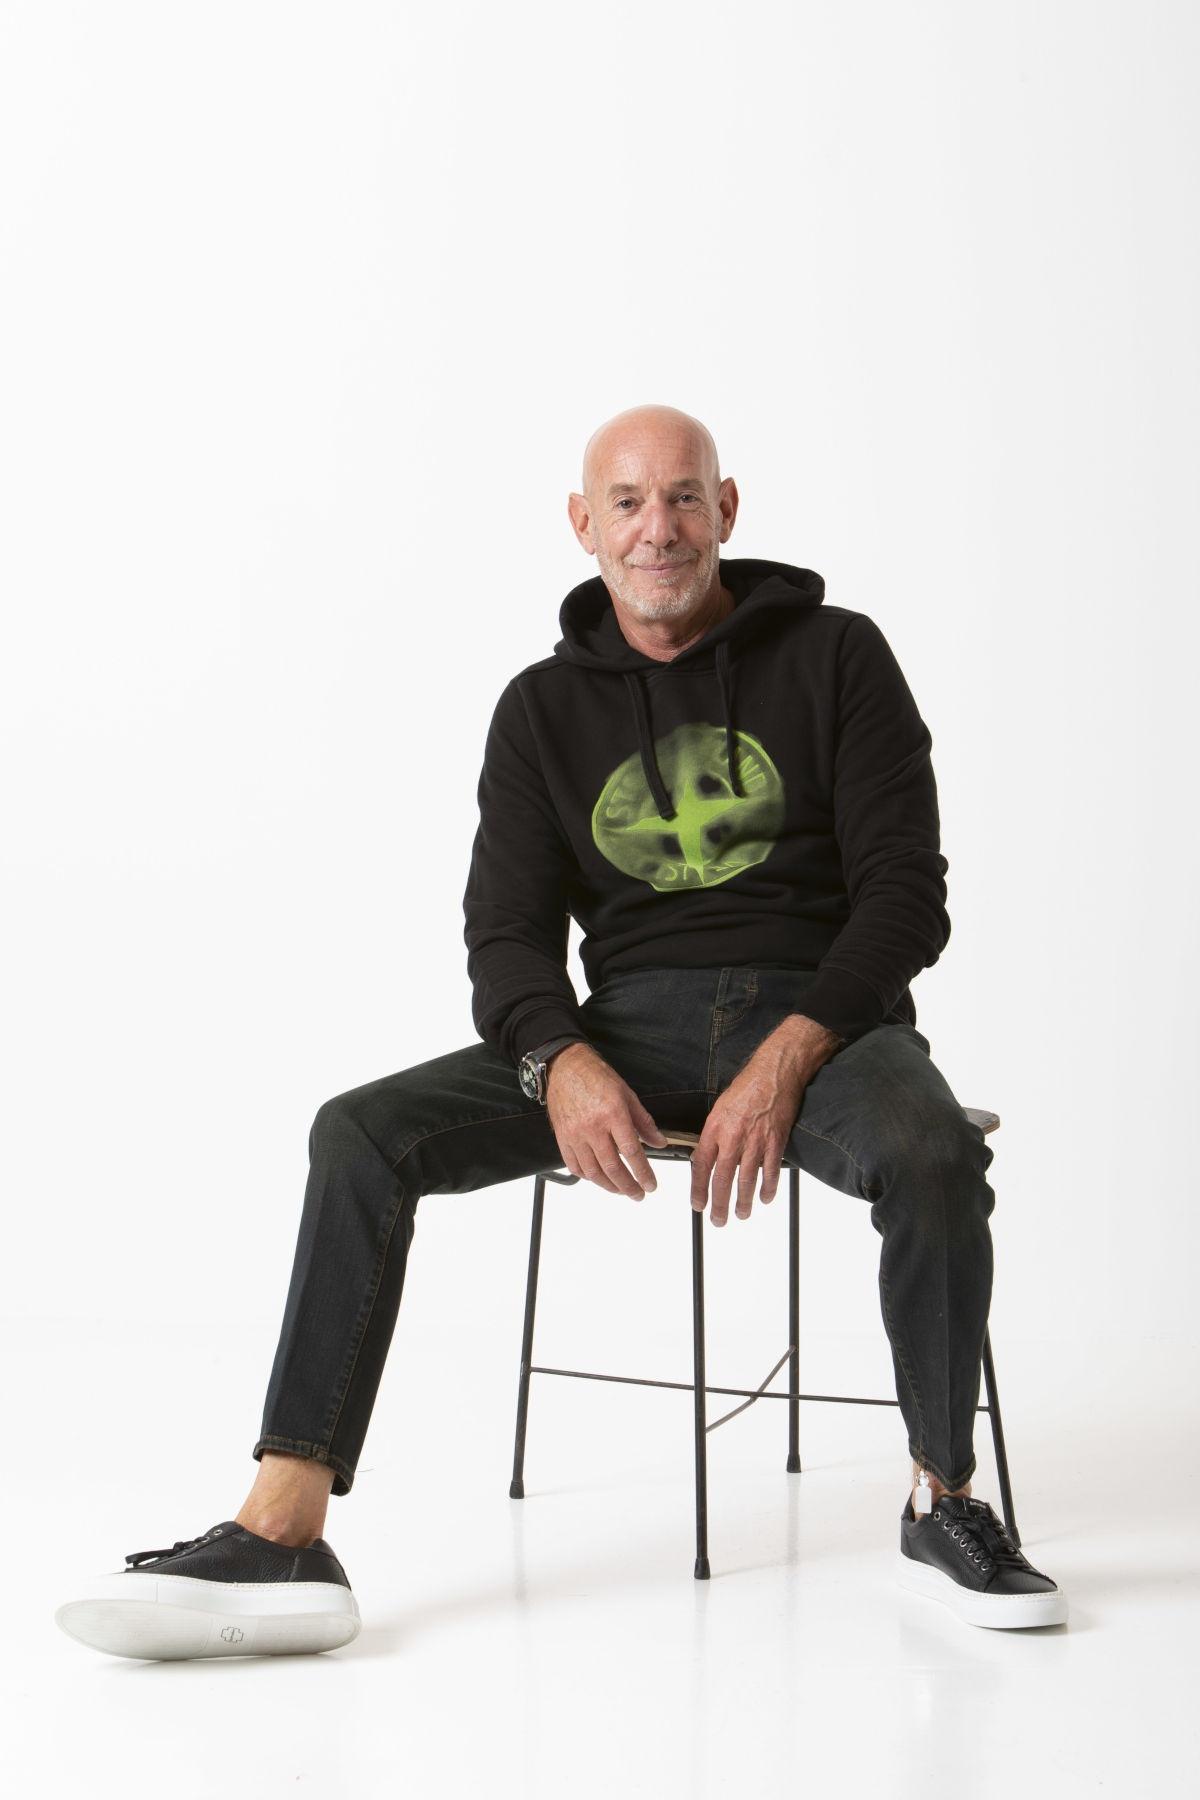 Sweatshirt for man STONE ISLAND F/W 19-20